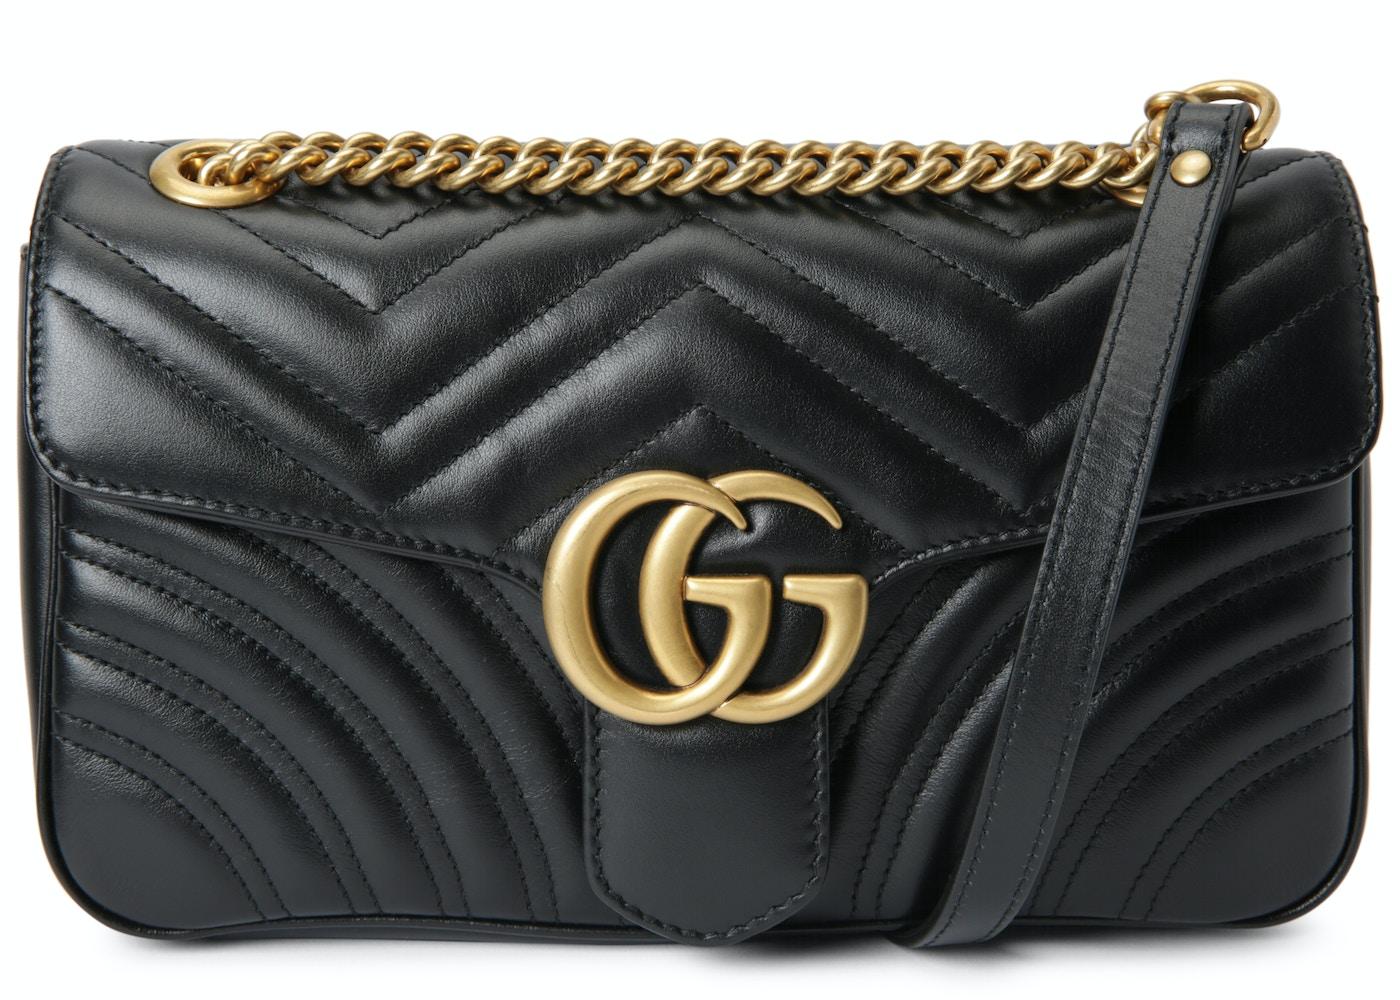 Blissfull: Gucci Gg Marmont Small Matelassé Shoulder Bag Price